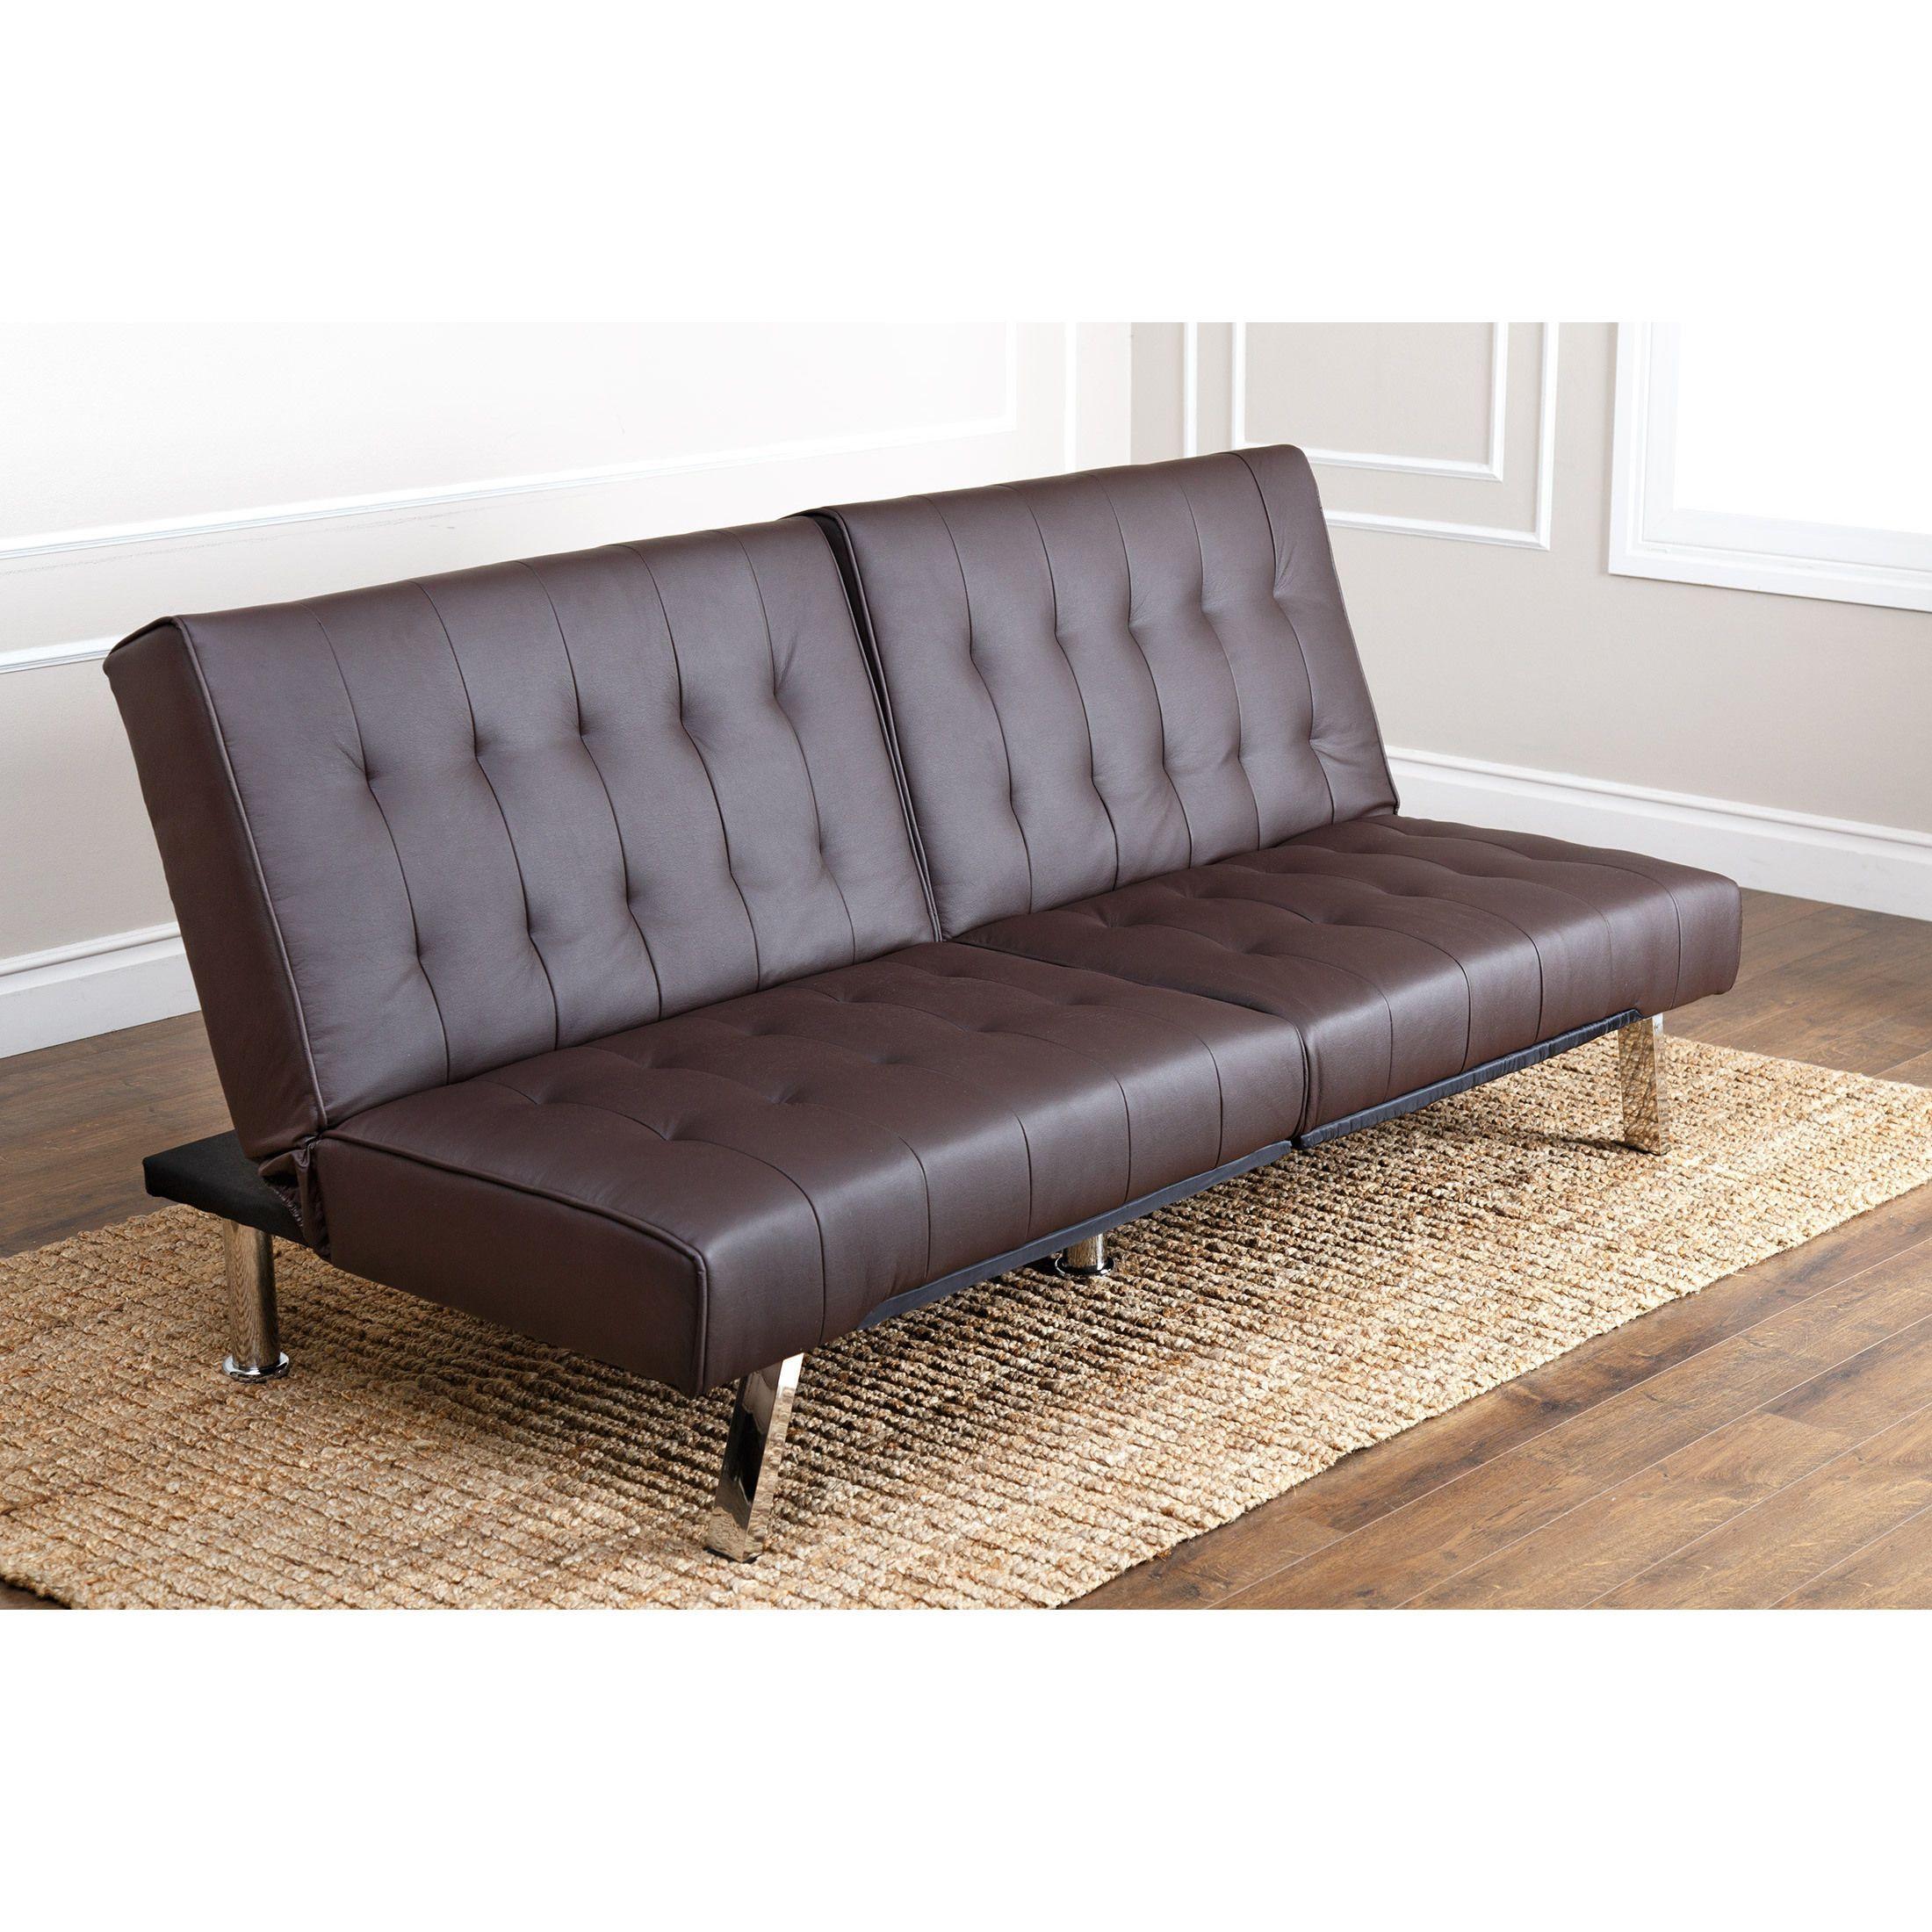 Astonishing Abbyson Living Jackson Dark Leather Foldable Futon Sofa Bed Onthecornerstone Fun Painted Chair Ideas Images Onthecornerstoneorg